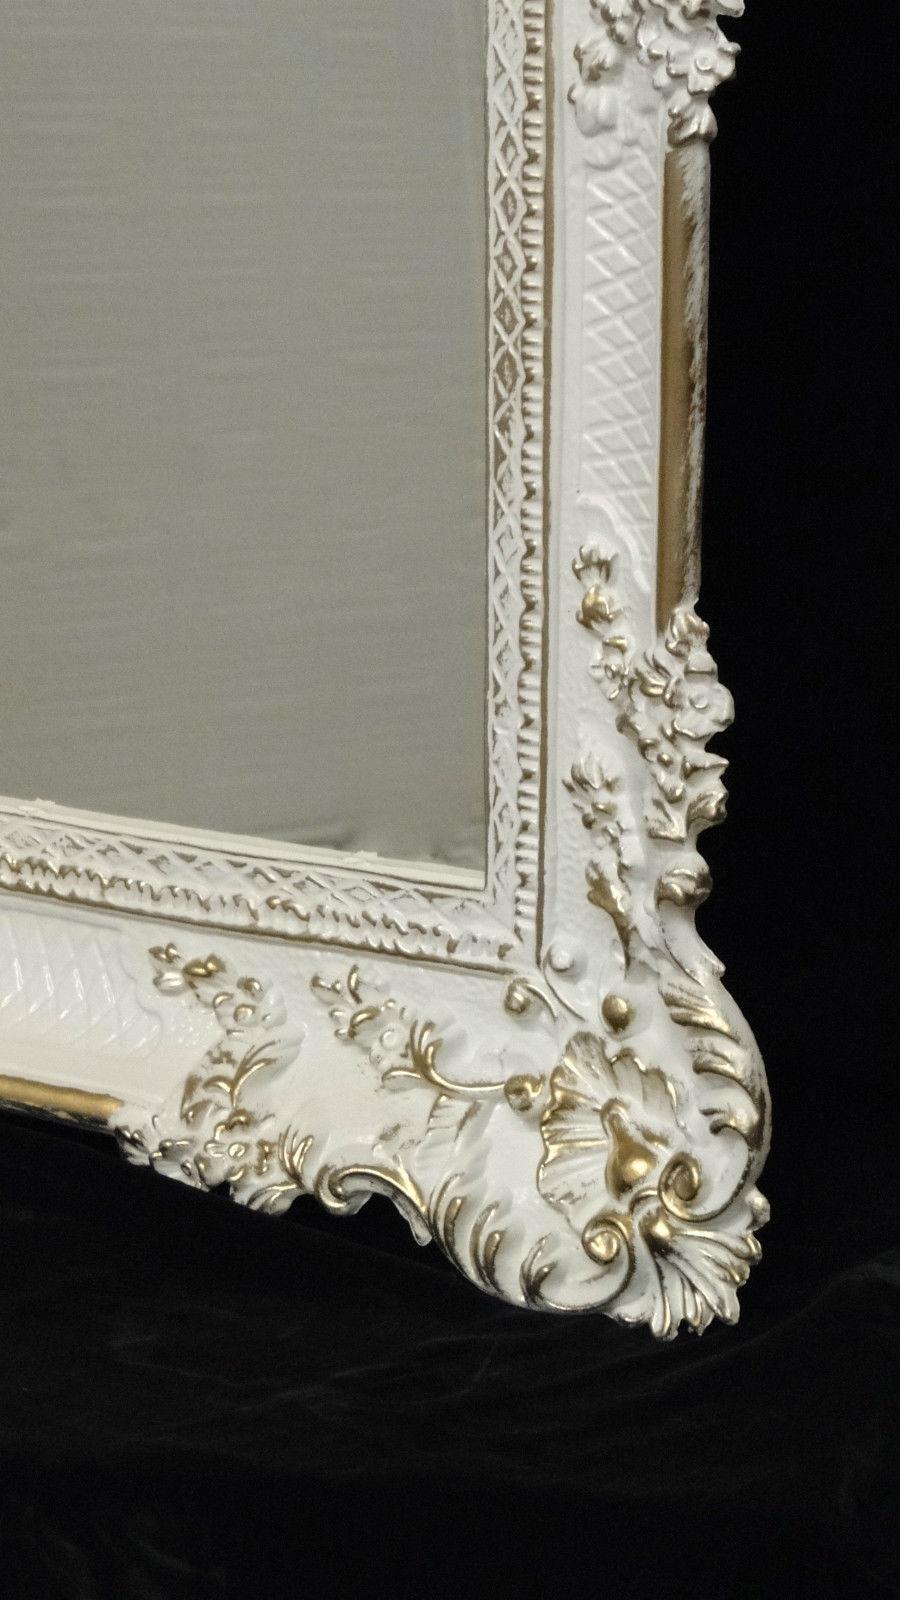 bilderrahmen barock hochzeitsrahmen wei gold antik 97x57. Black Bedroom Furniture Sets. Home Design Ideas